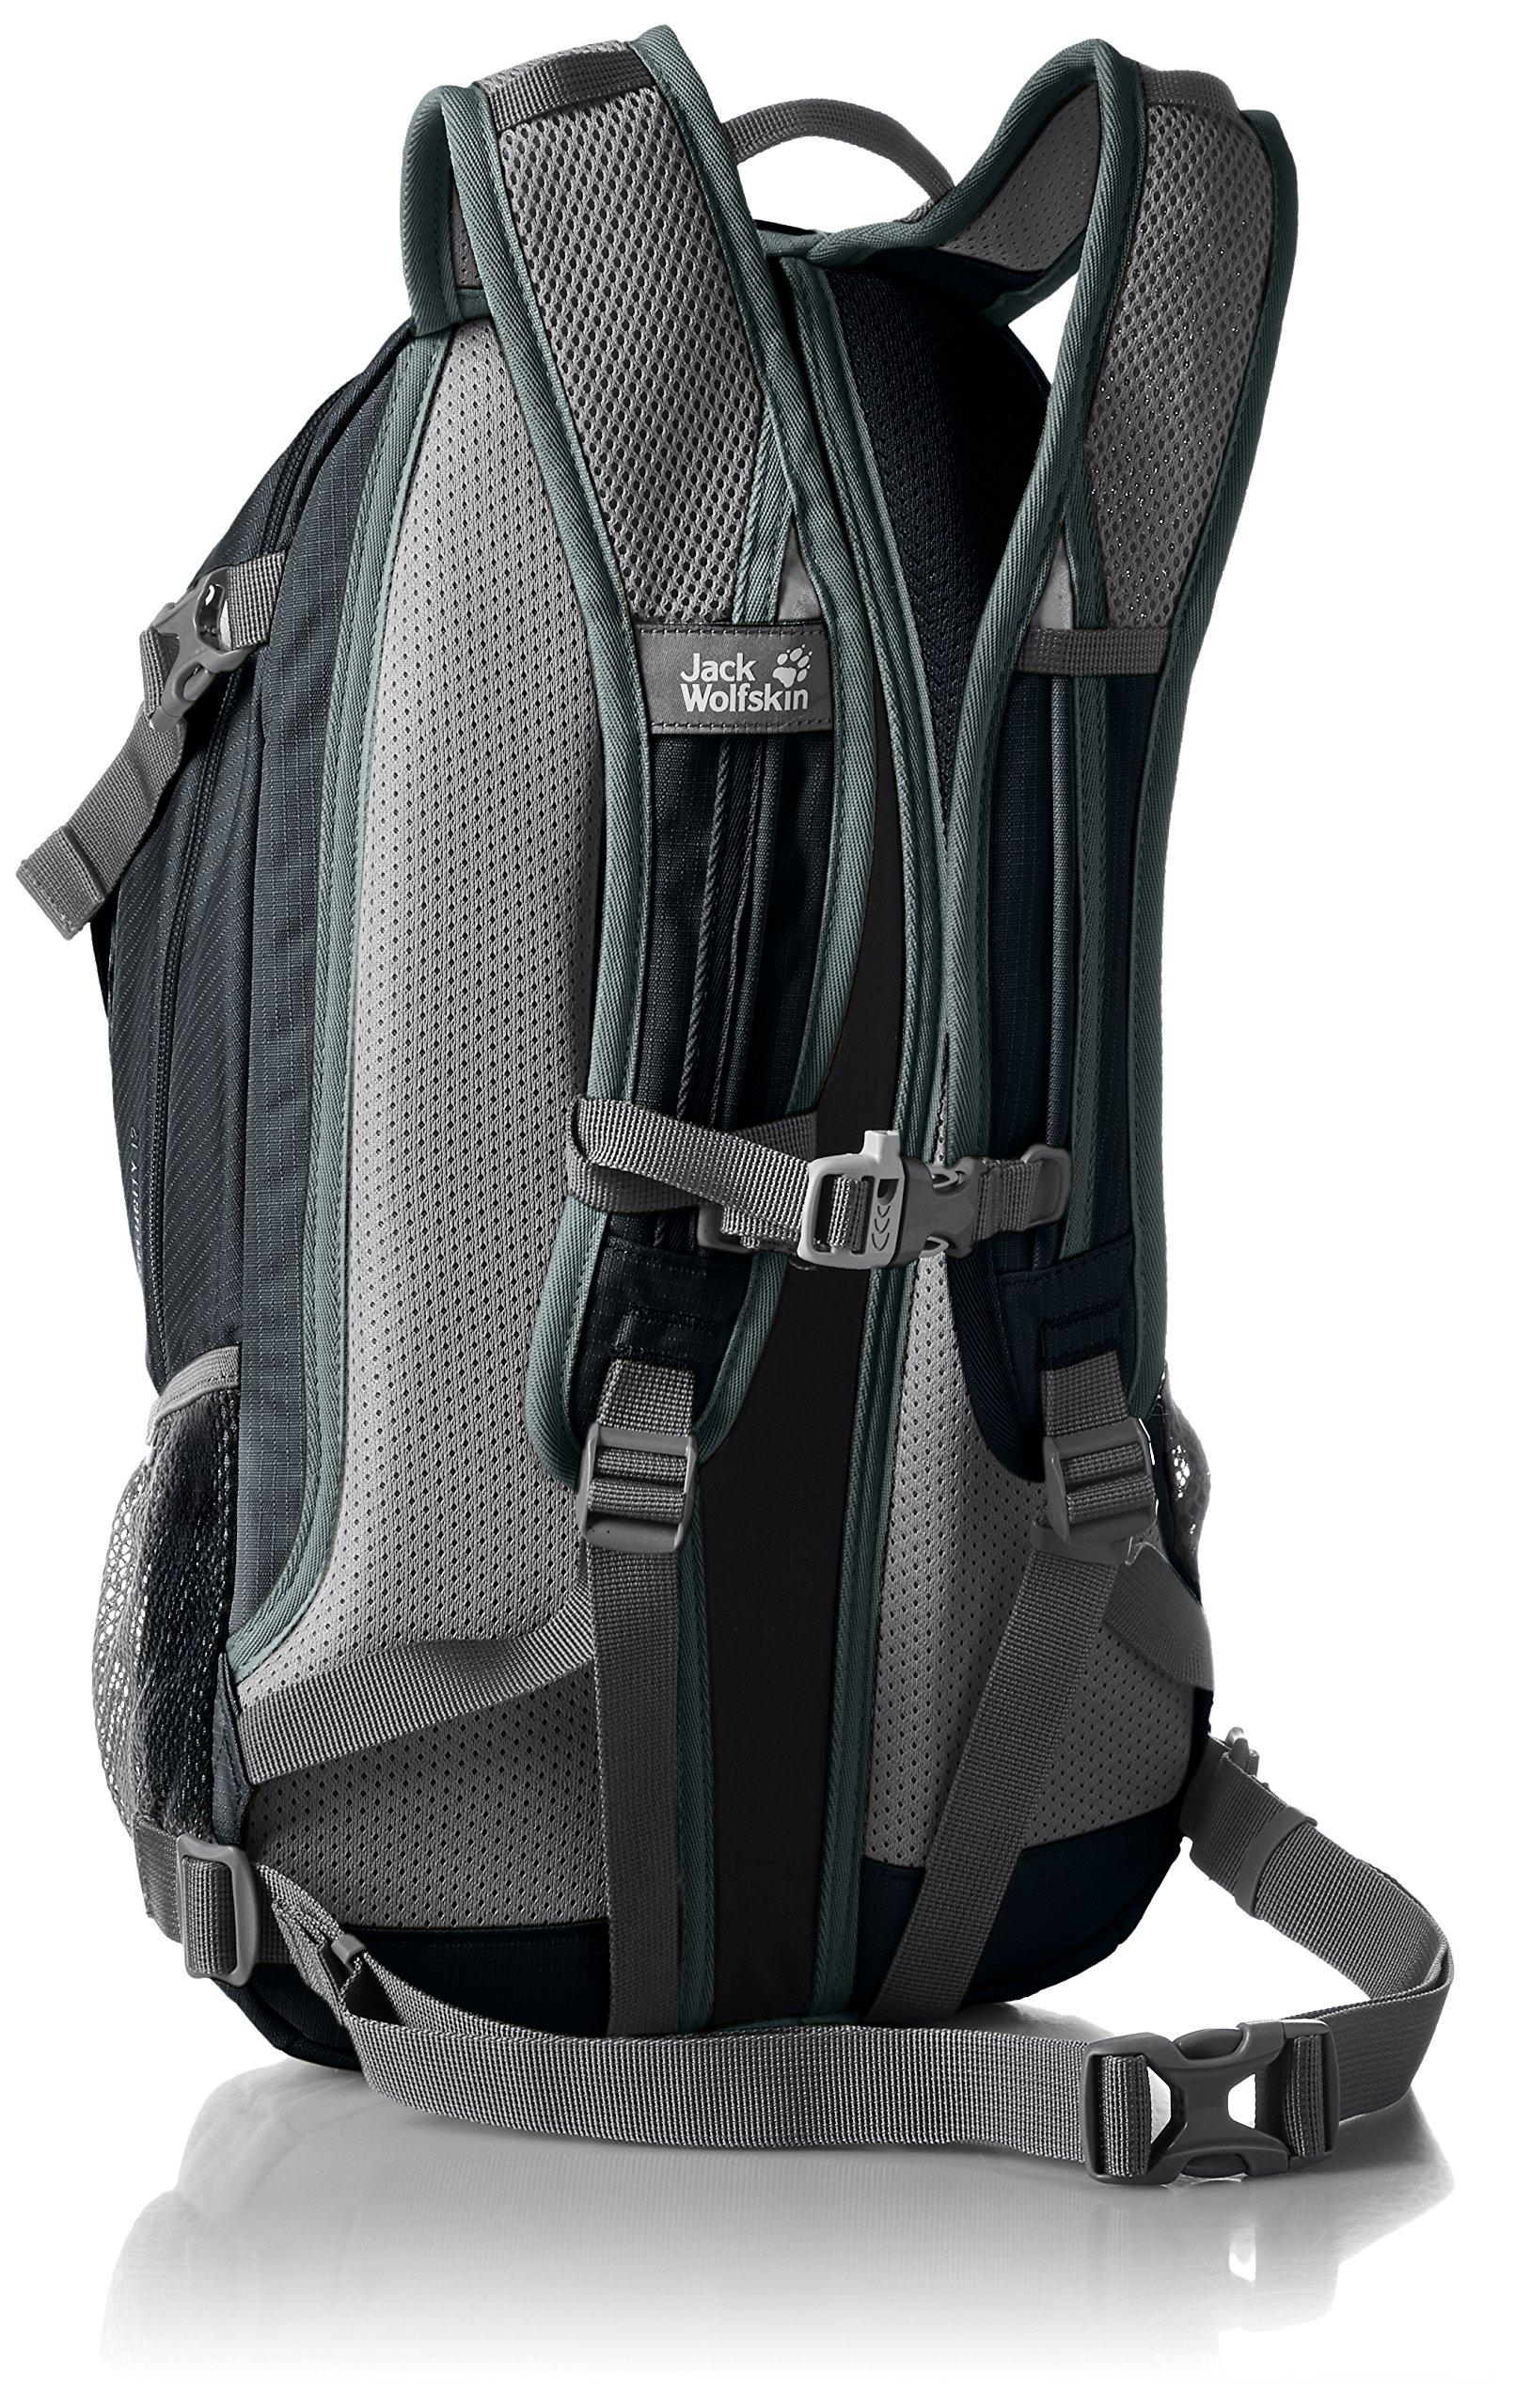 Jack Wolfskin Velocity 12 Litres Bike Backpack